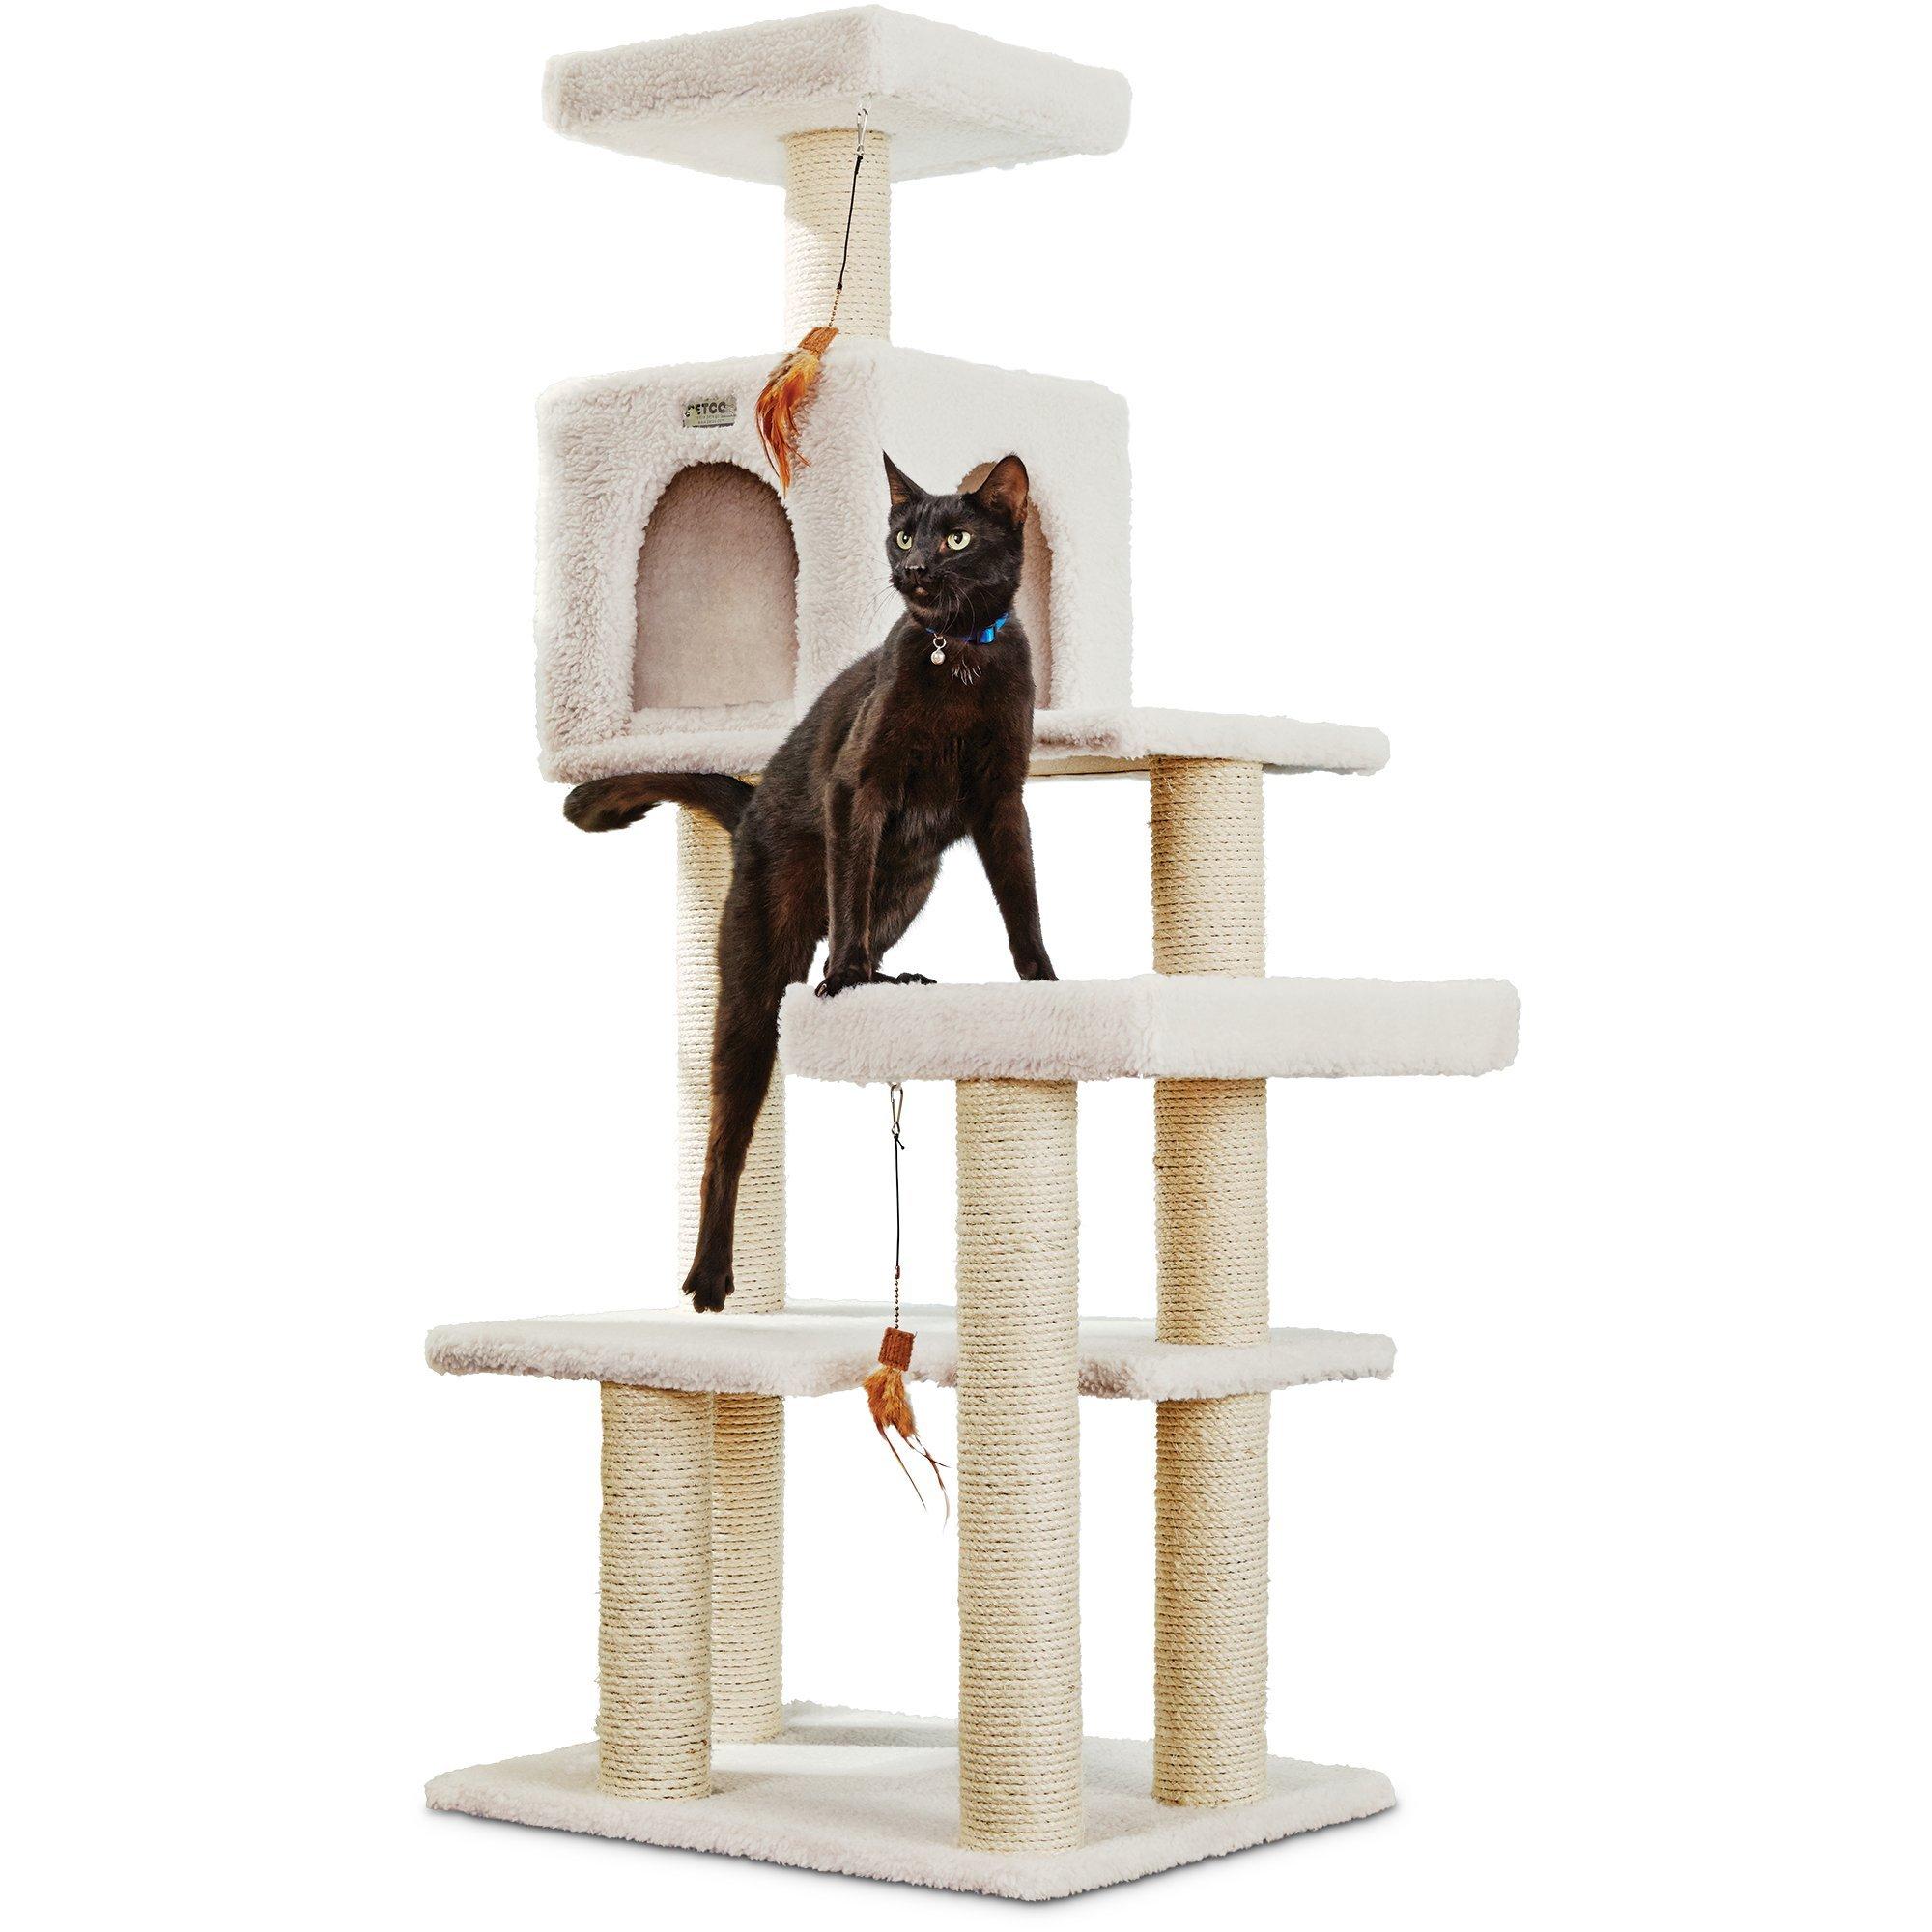 You & Me Scratch & Snooze Station Cat Tree, 19.7'' L X 28'' W X 55'' H